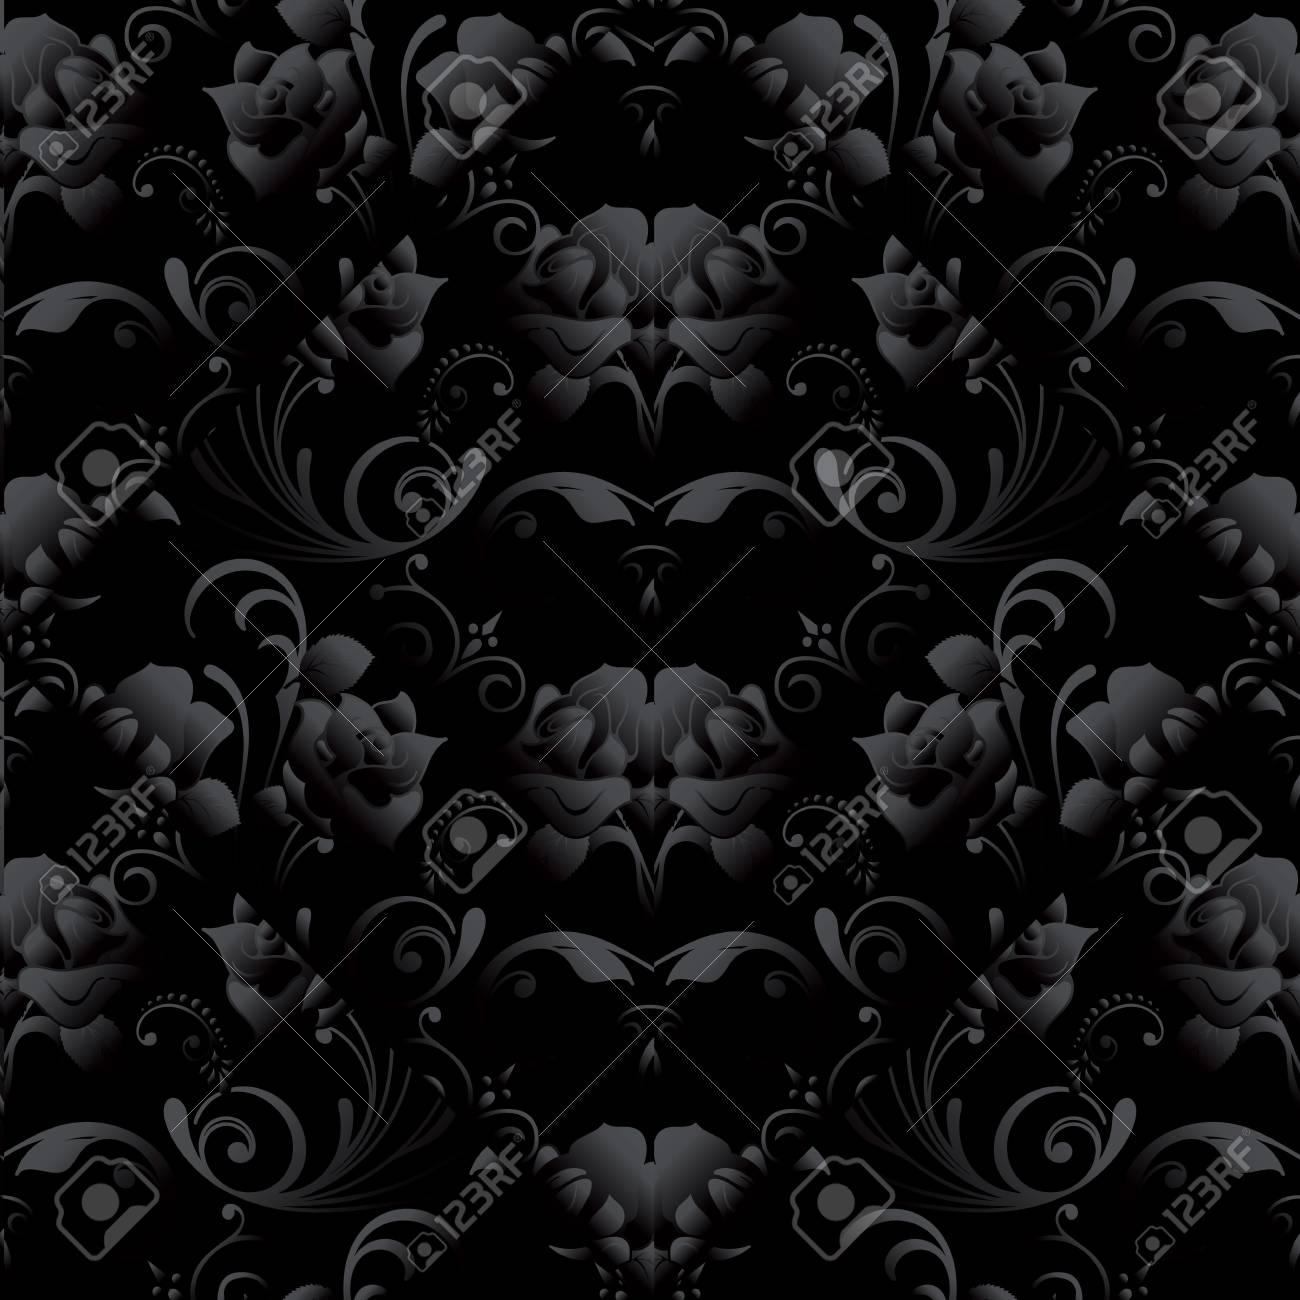 Black Roses Seamless Pattern Vector Dark Black Floral Background